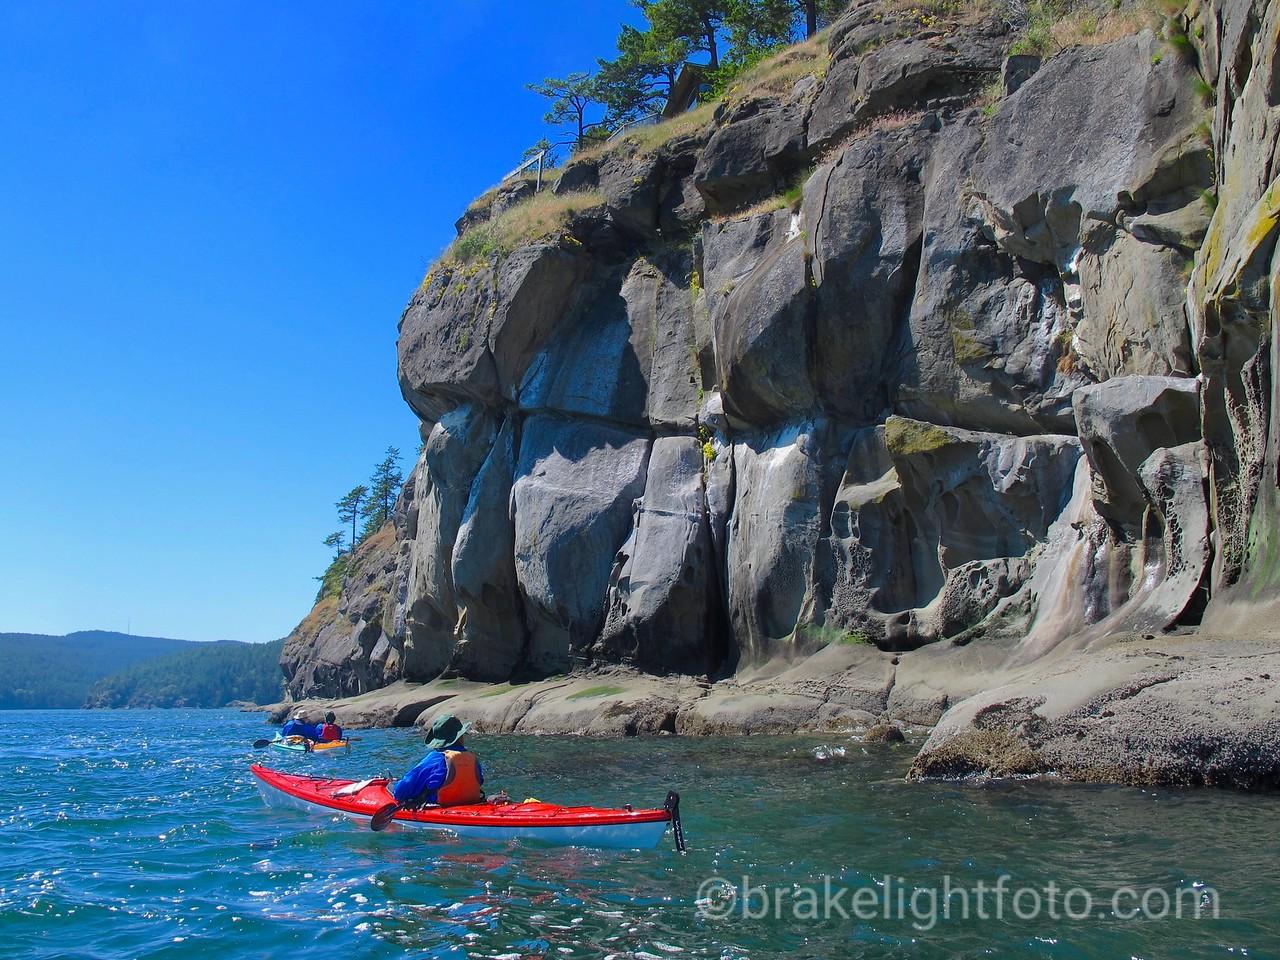 Sandstone Bluffs & Kayakers, Saturna Island